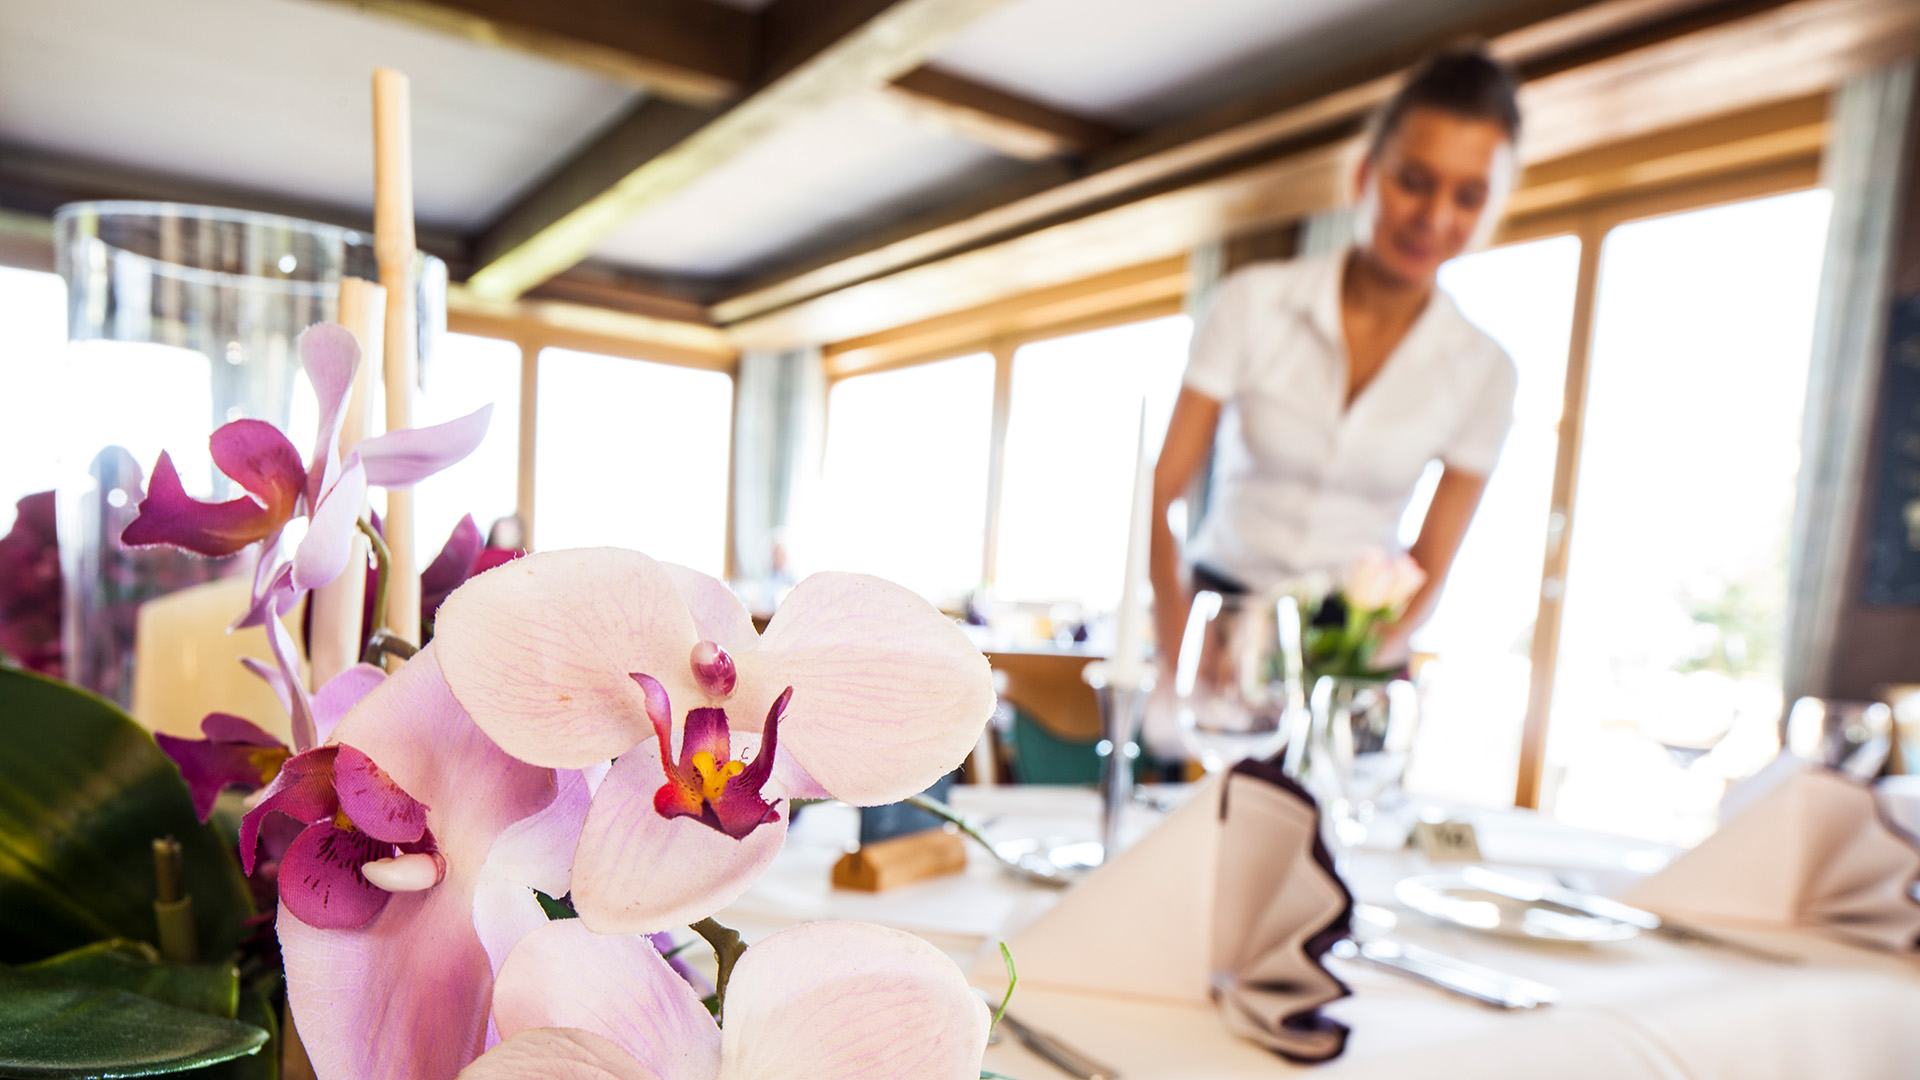 Fotografie Gastronomie + Hotelerie - Adlerhof Straubenhardt